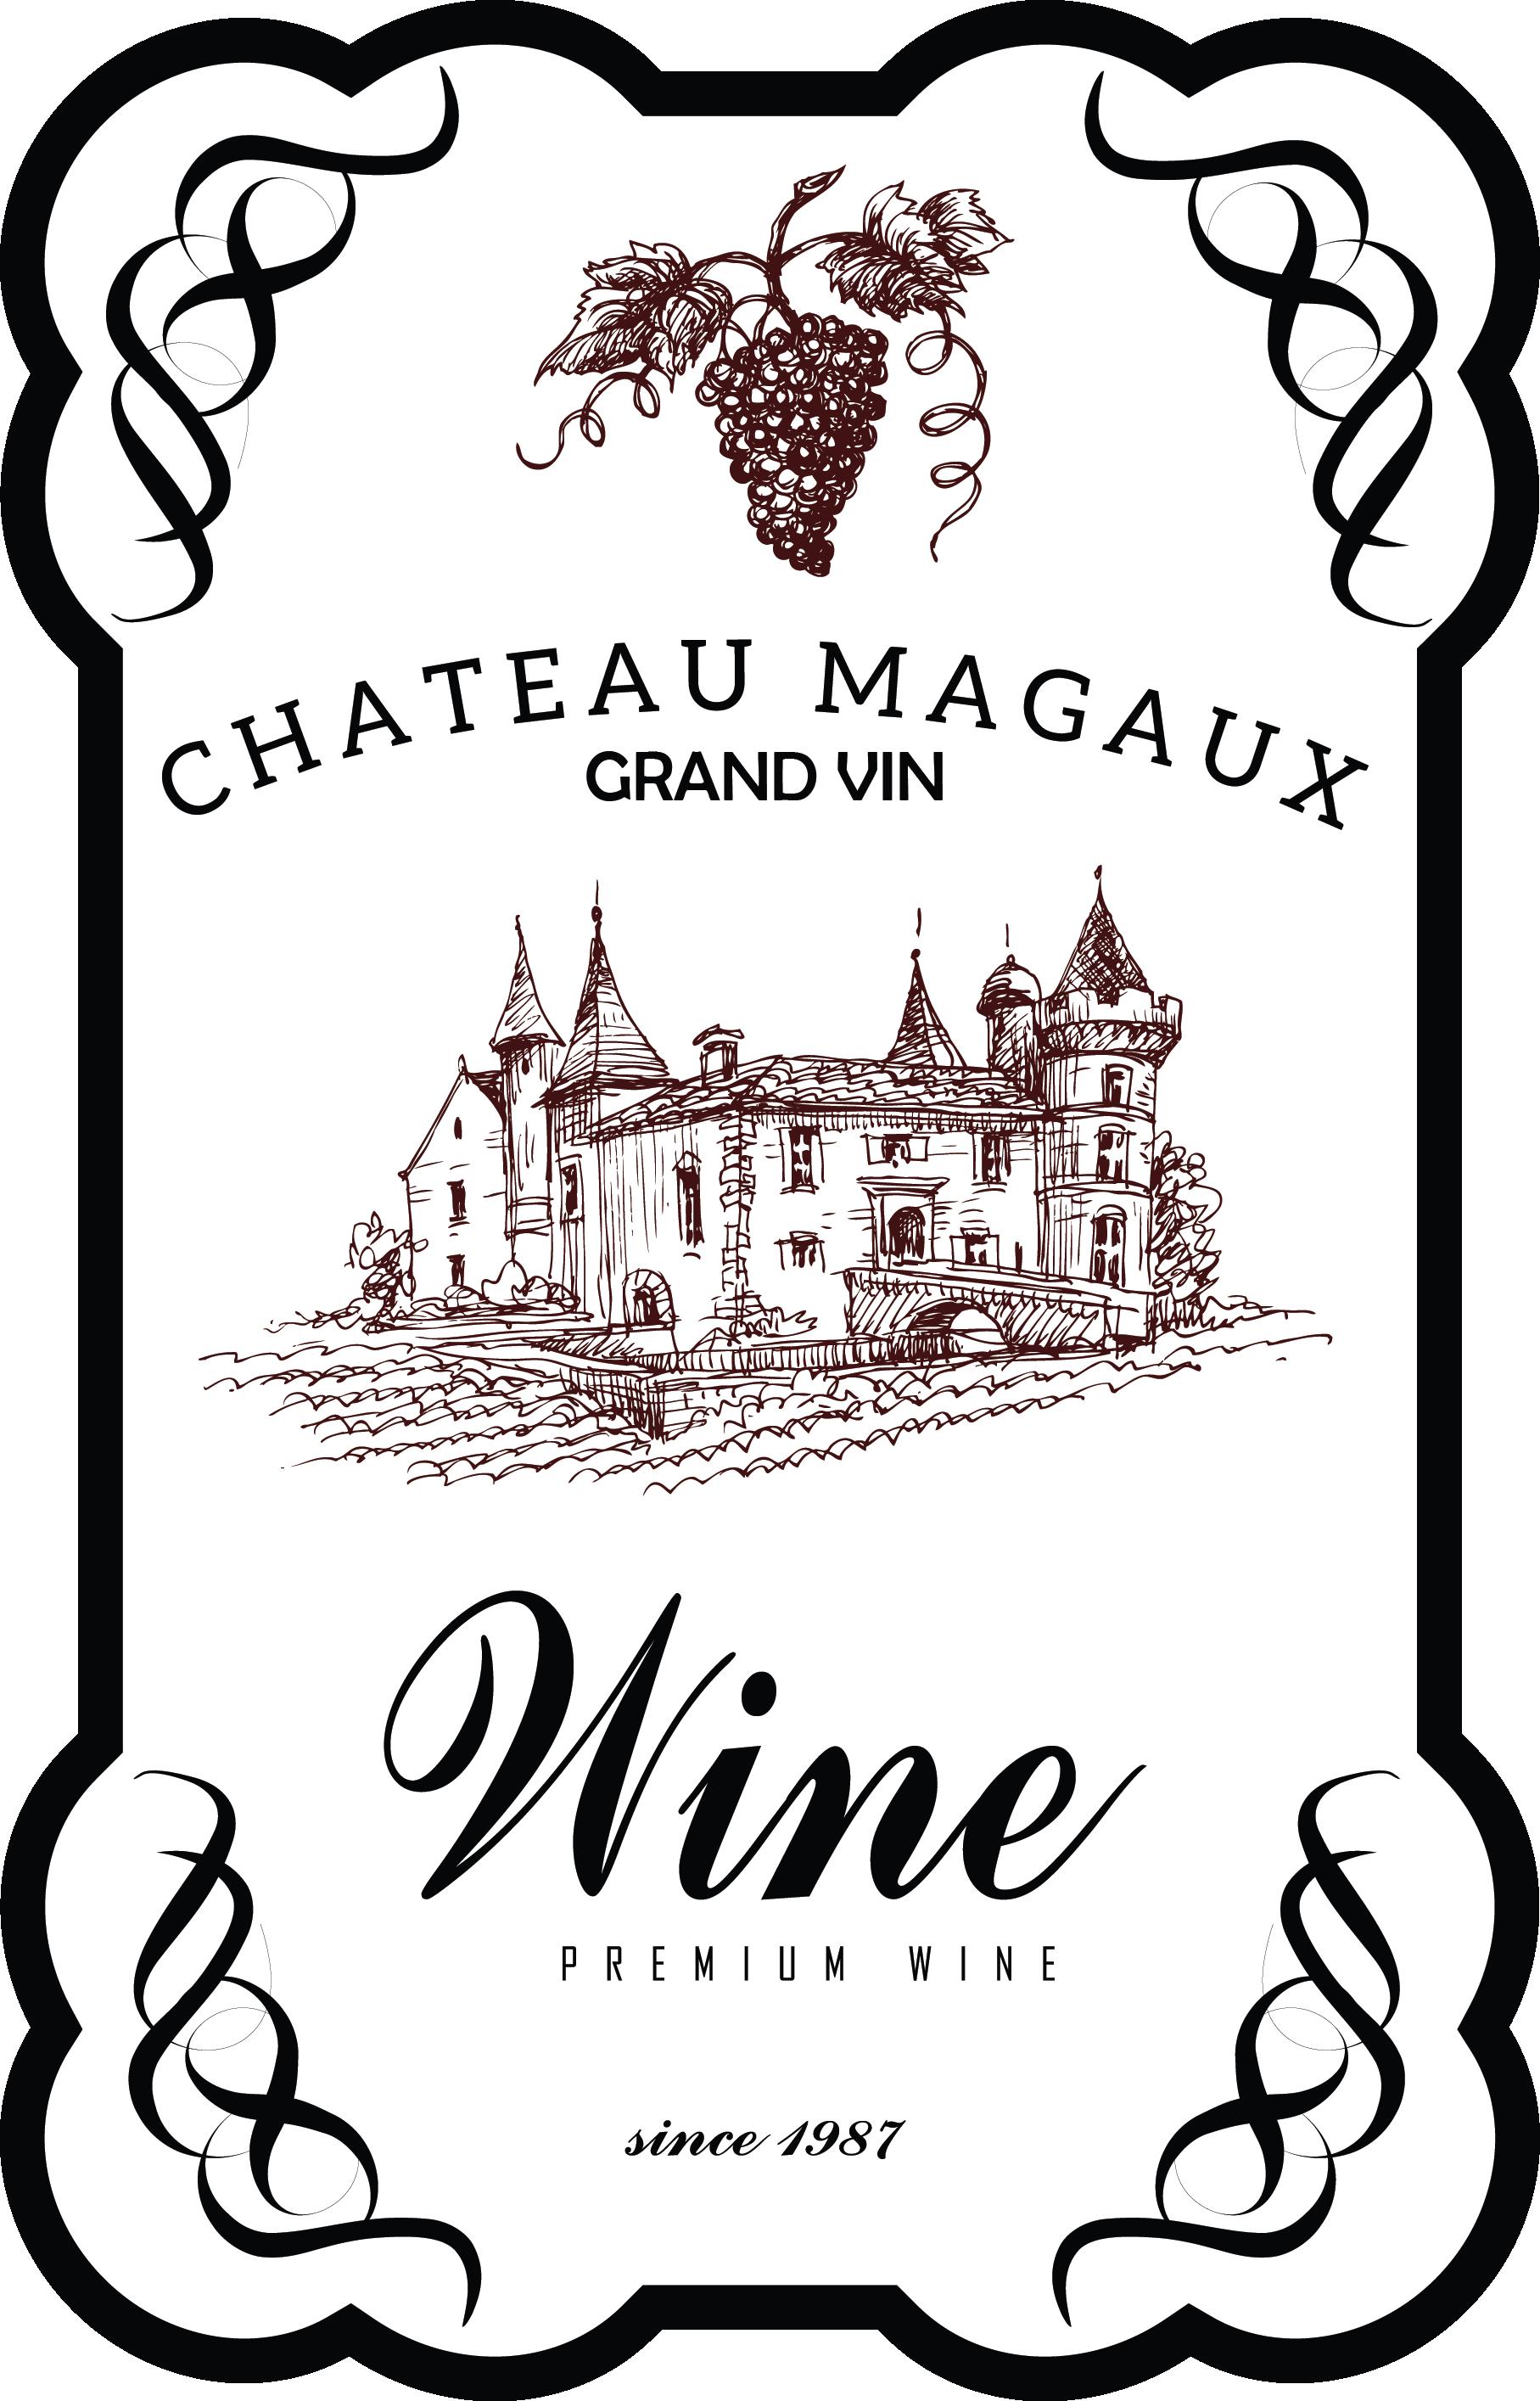 22+ Wine bottle label clipart ideas